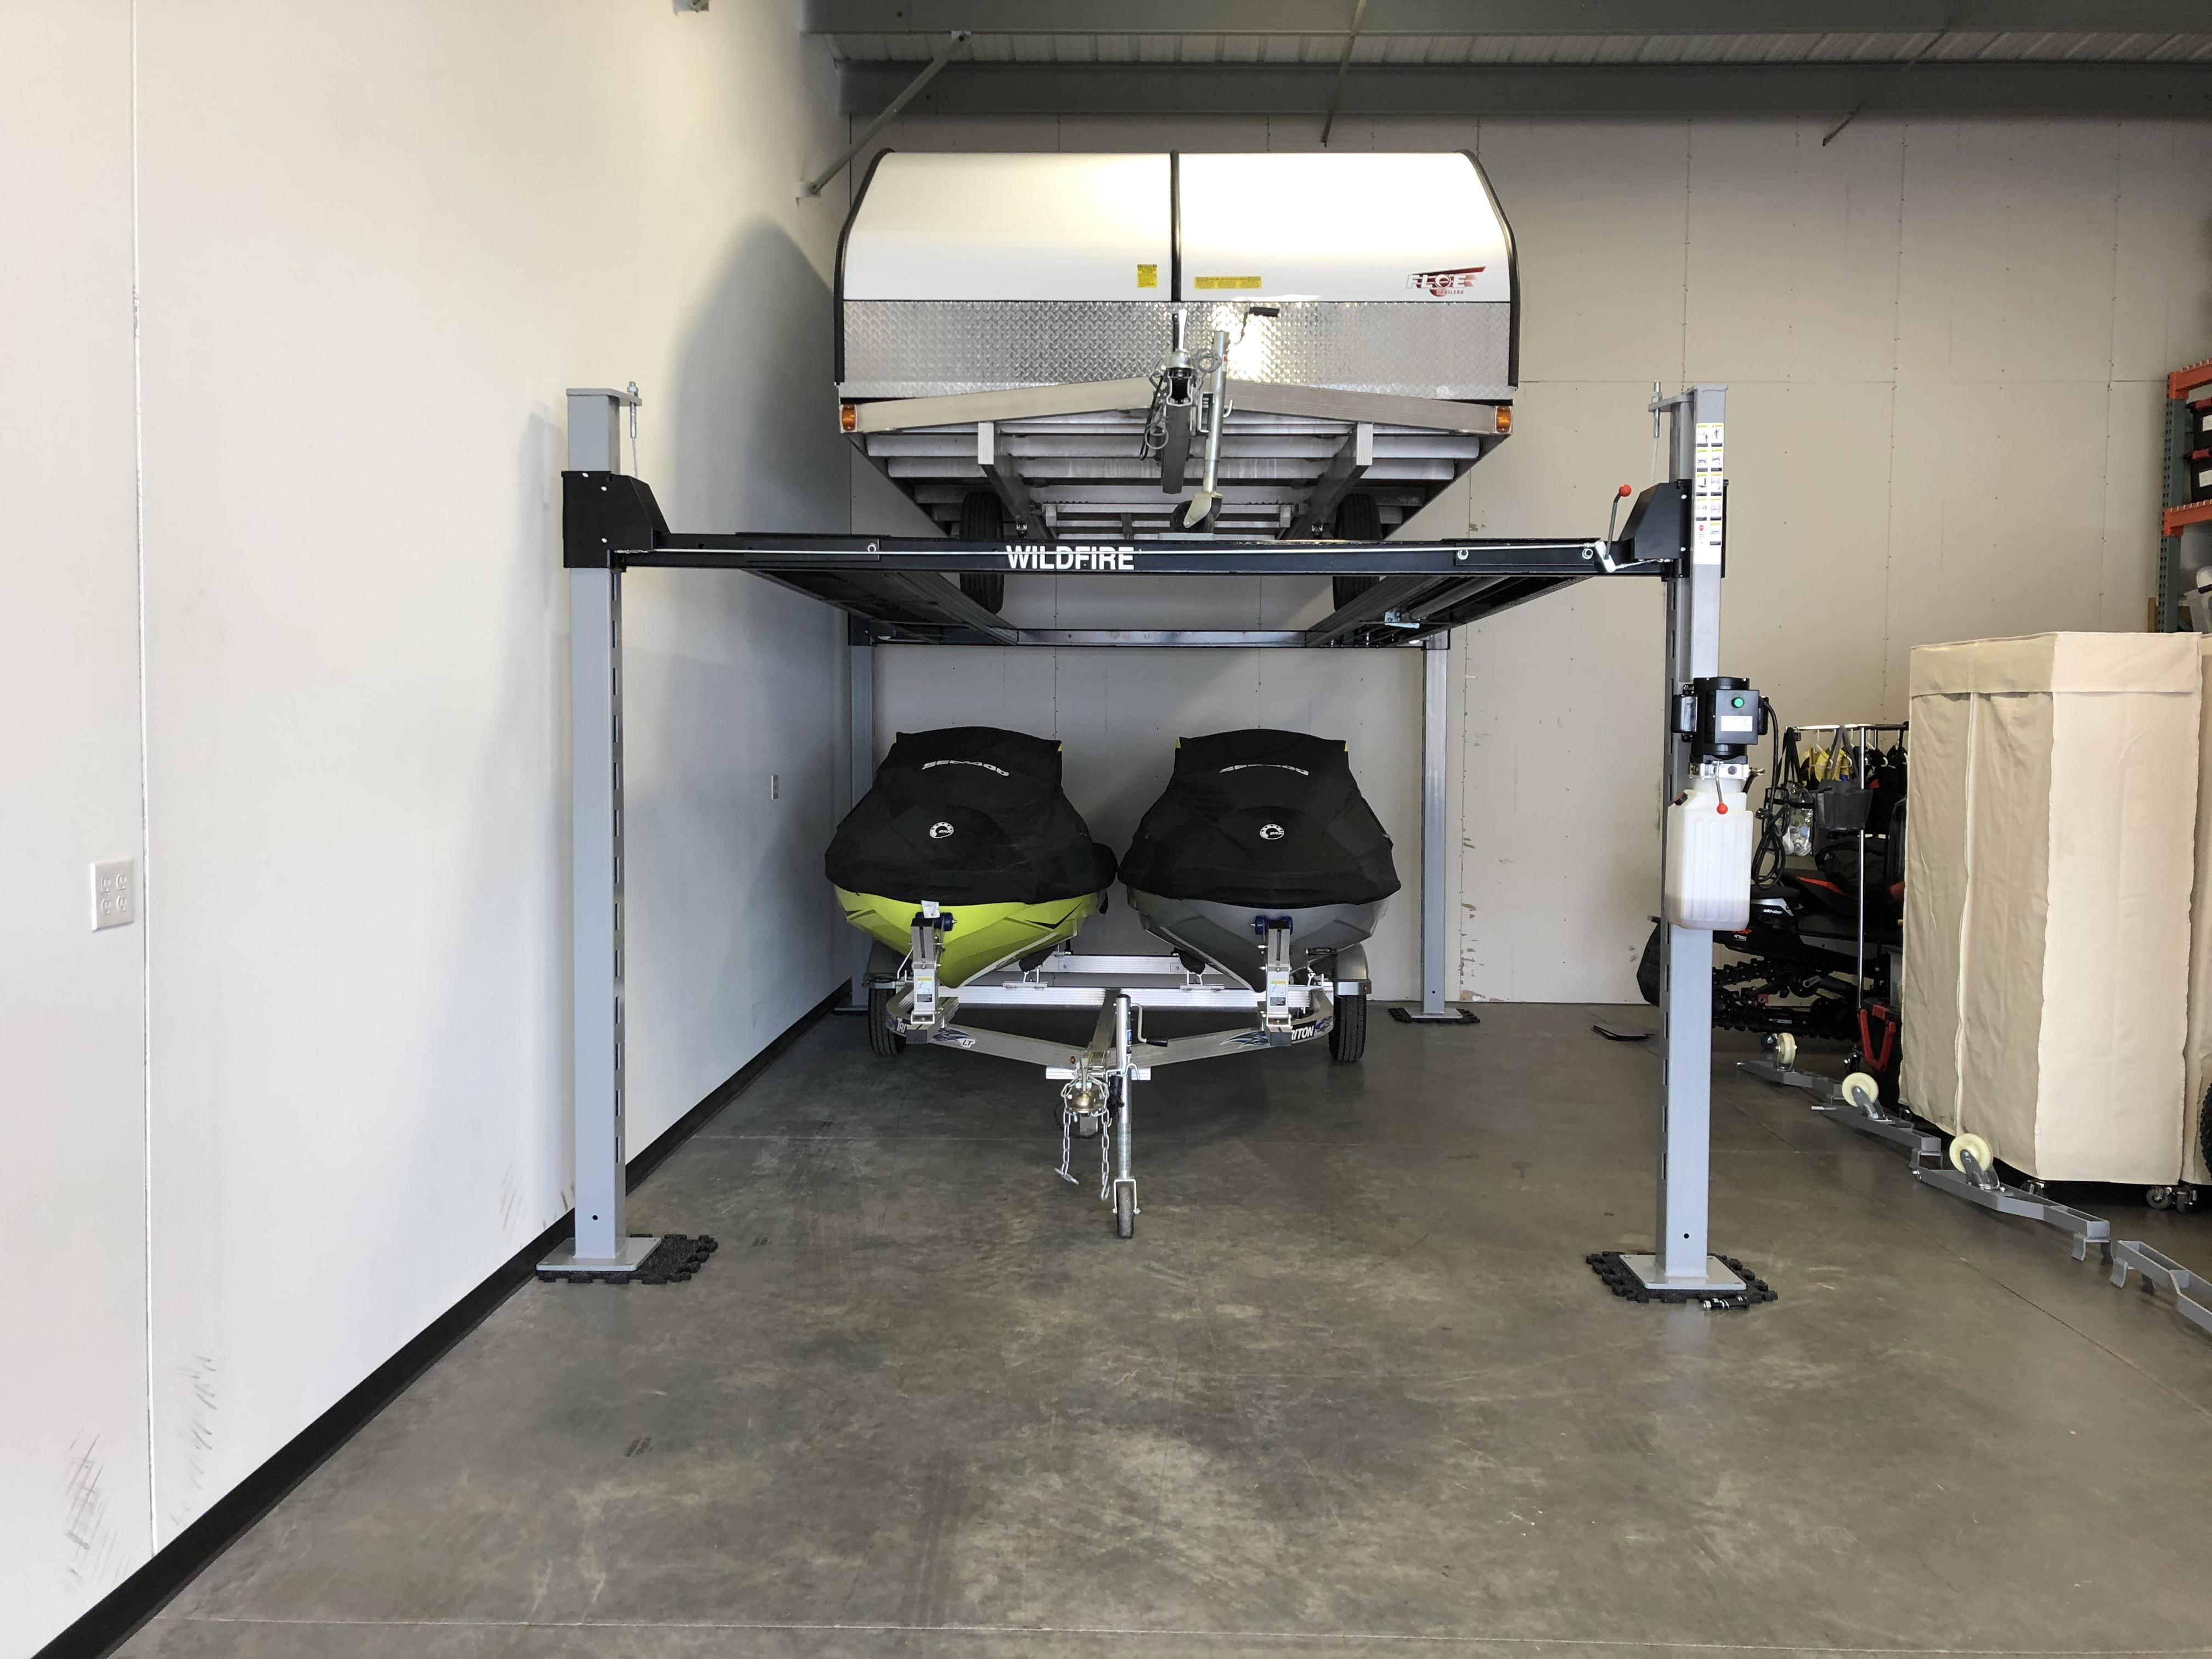 4 Post Trailer Lift, Jet Ski and Snowmob